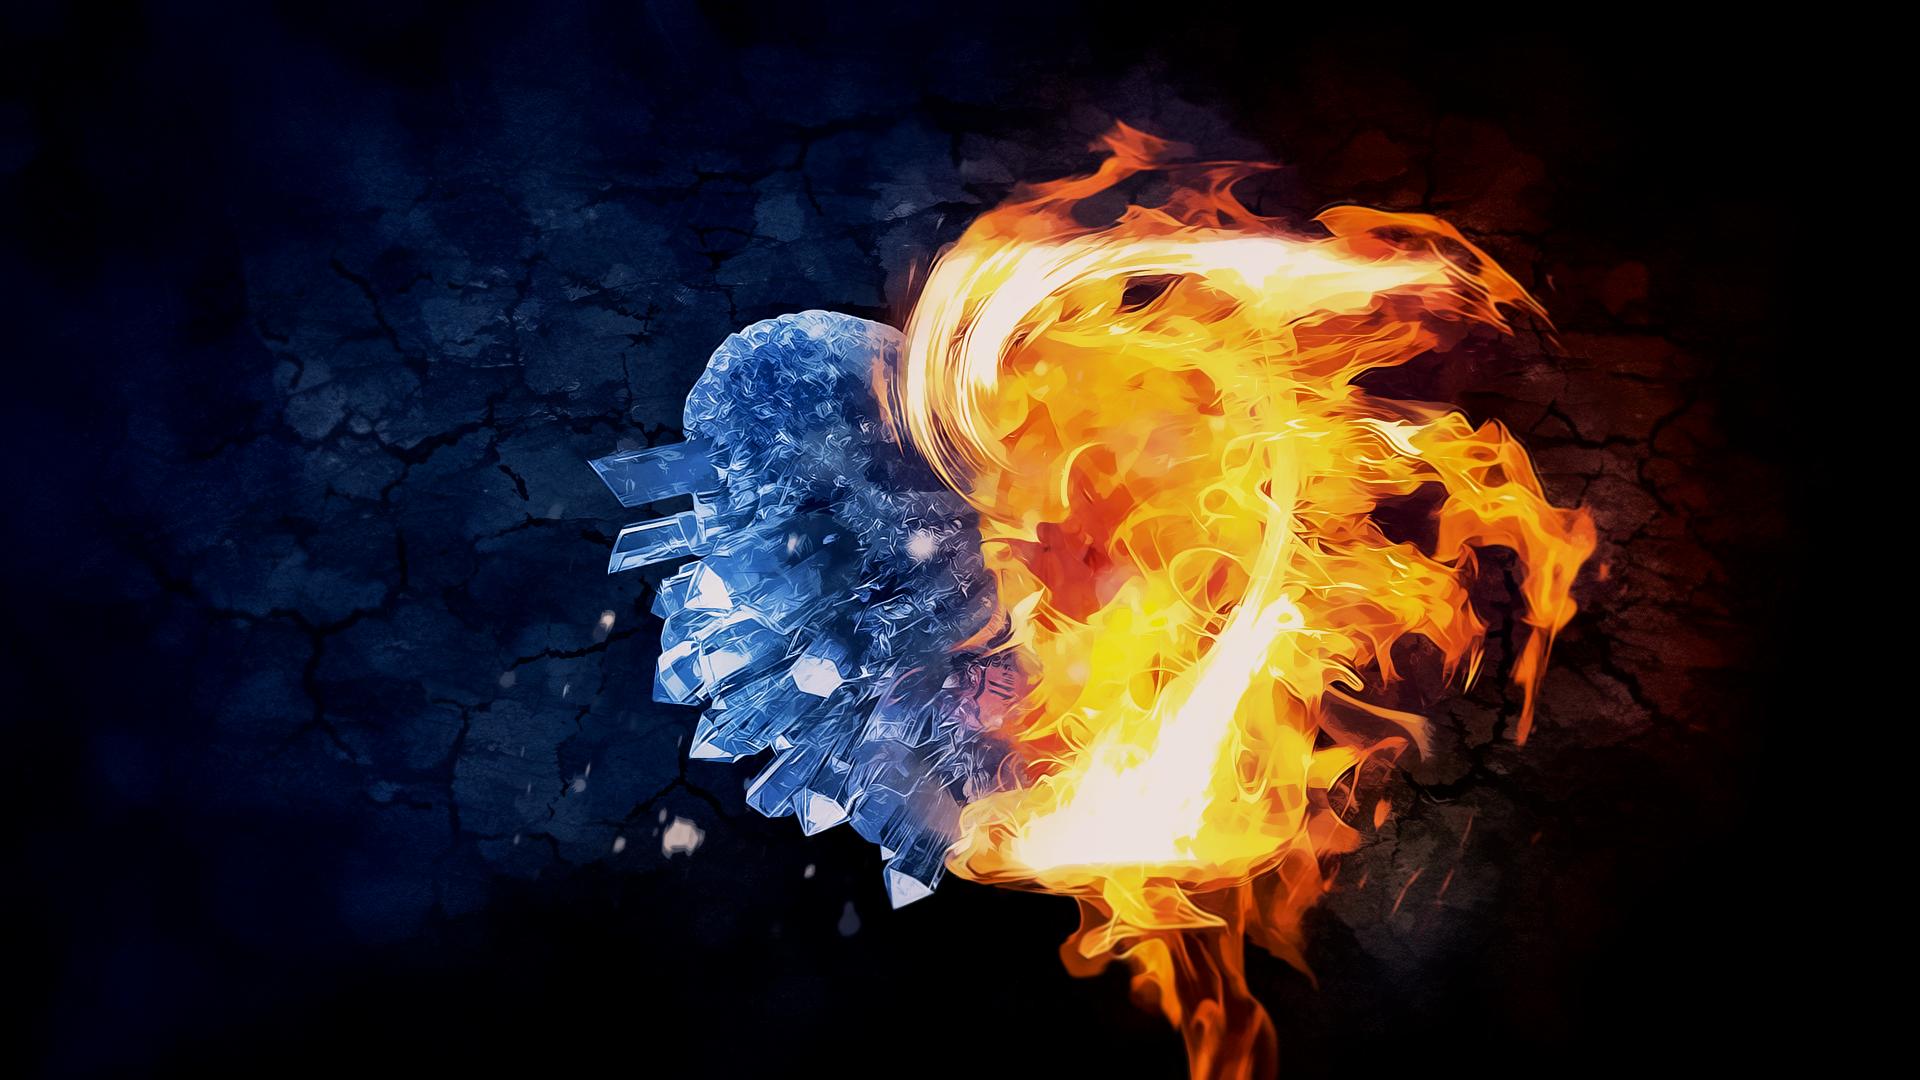 General 1920x1080 CG digital art digital abstract 3D Abstract love heart fire ice romance